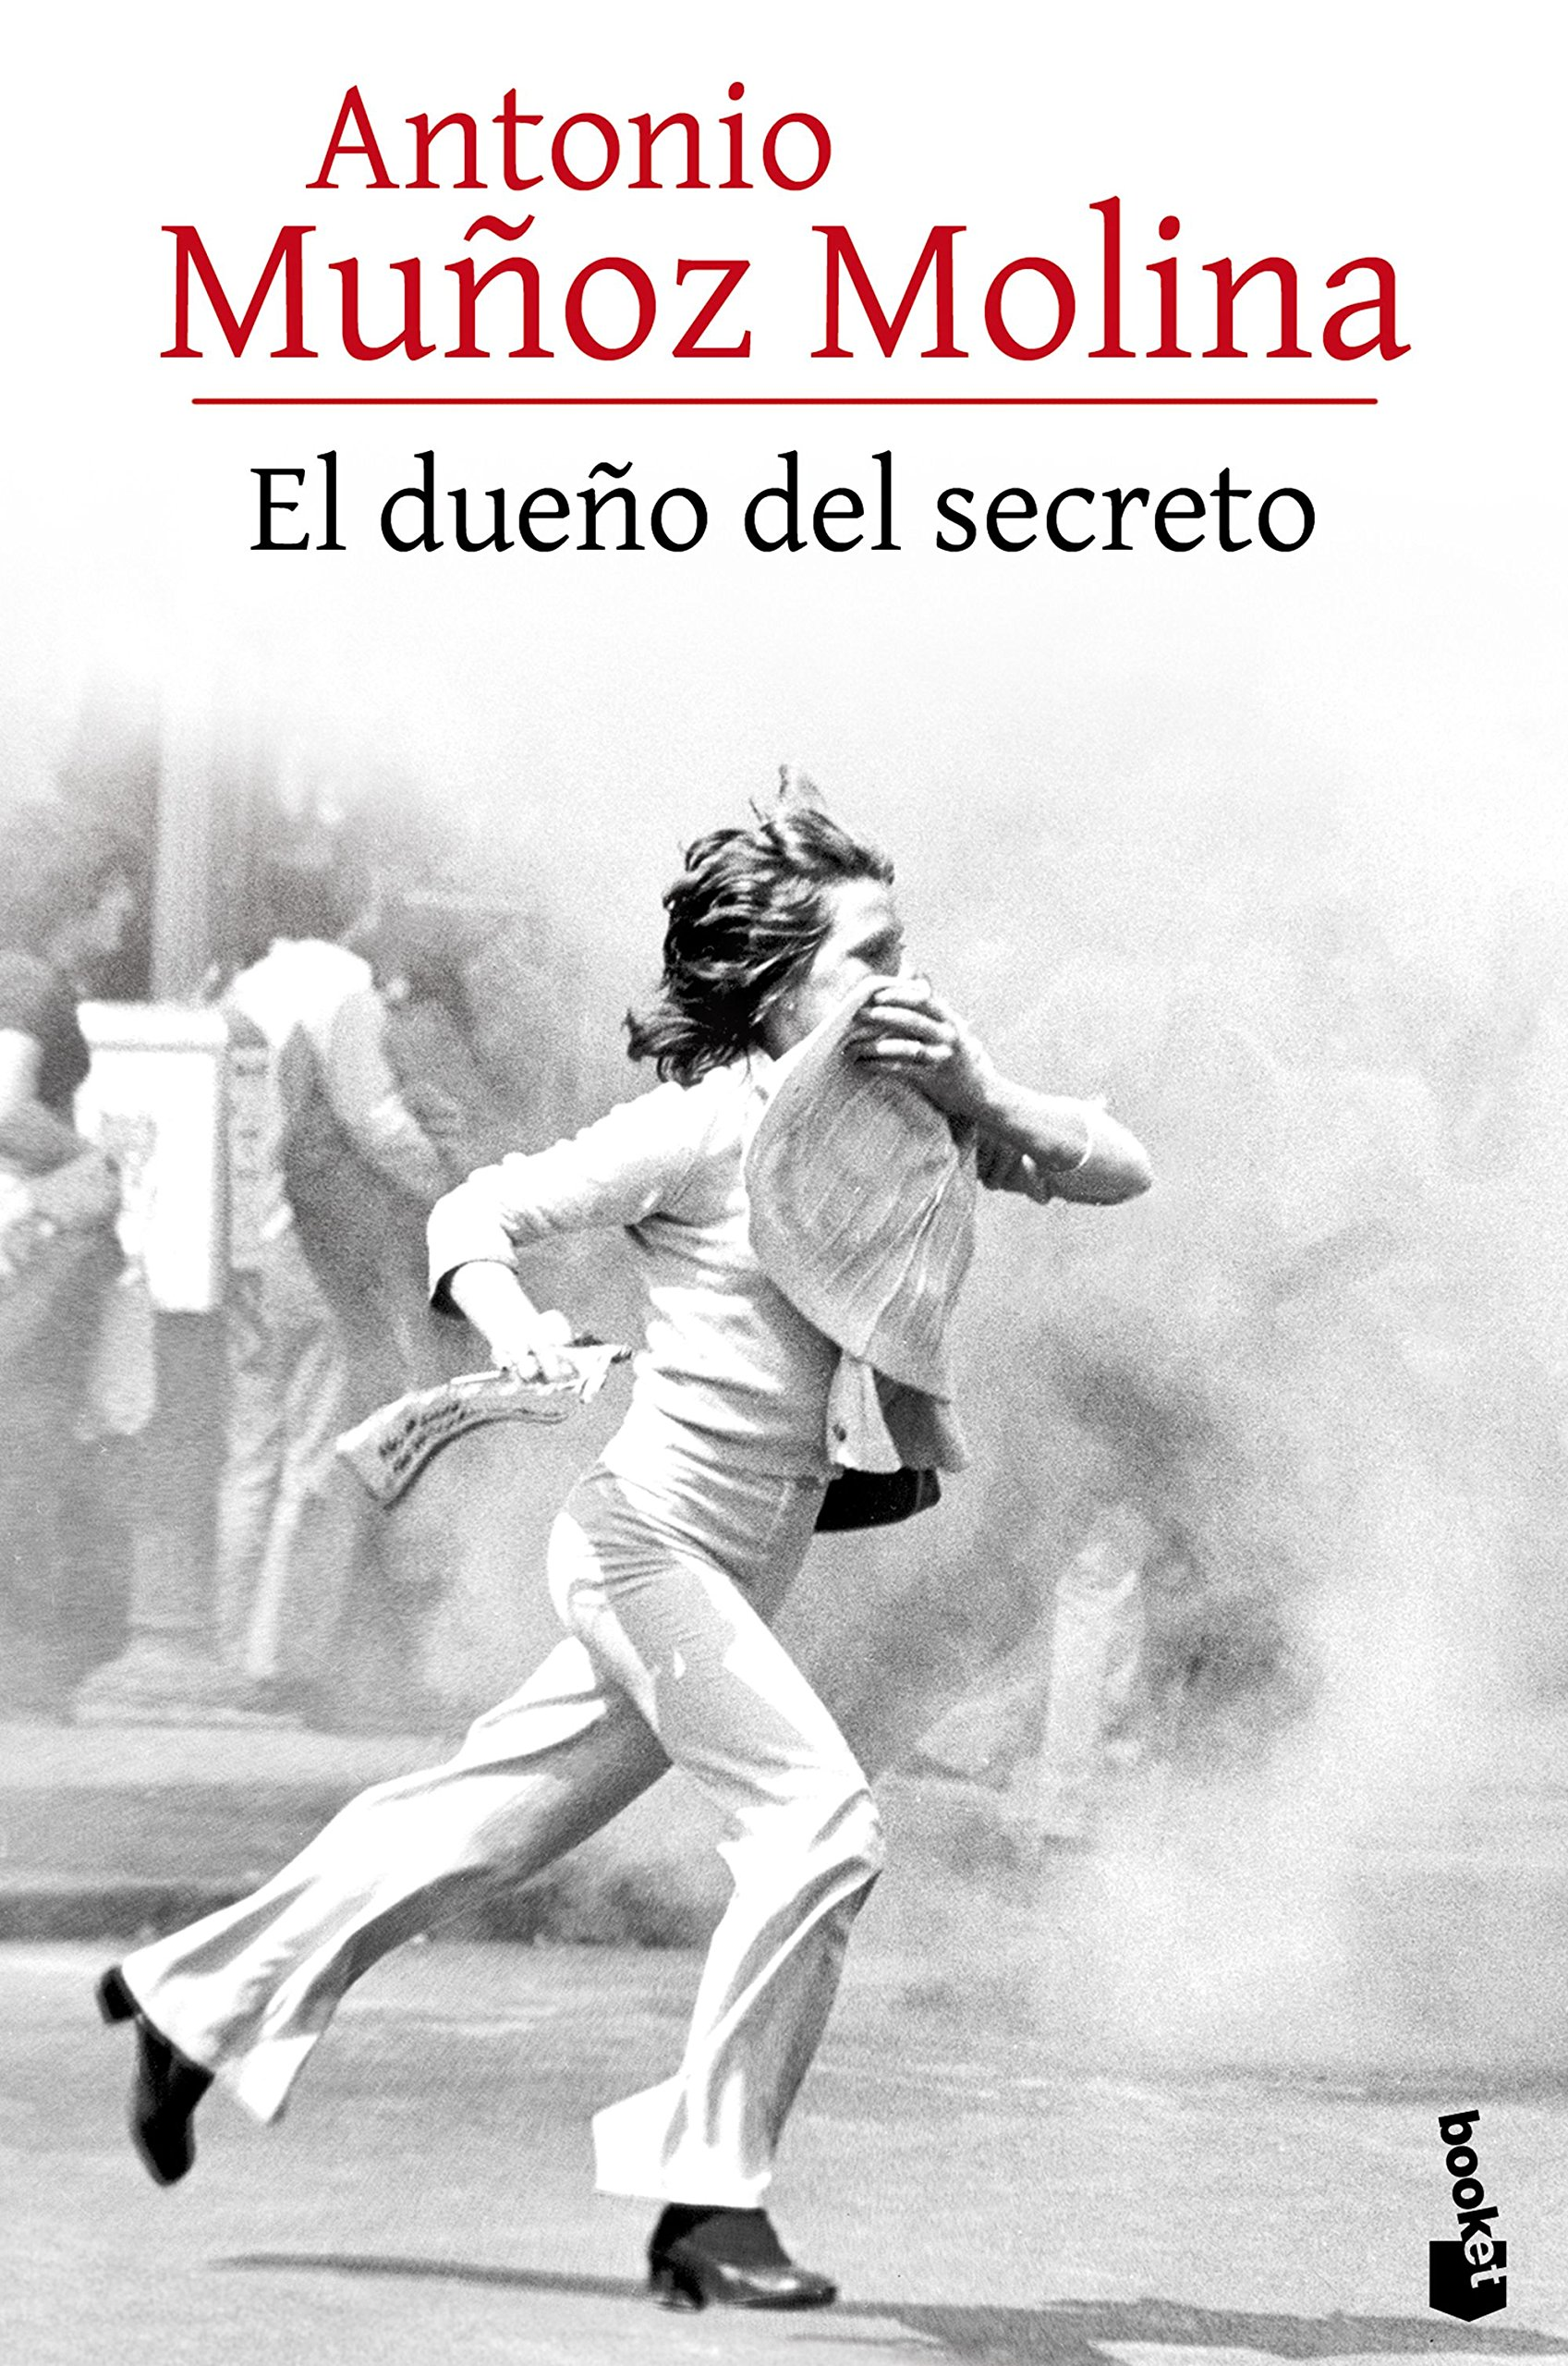 El dueño del secreto: 2 Biblioteca Antonio Muñoz Molina: Amazon.es: Muñoz Molina, Antonio: Libros